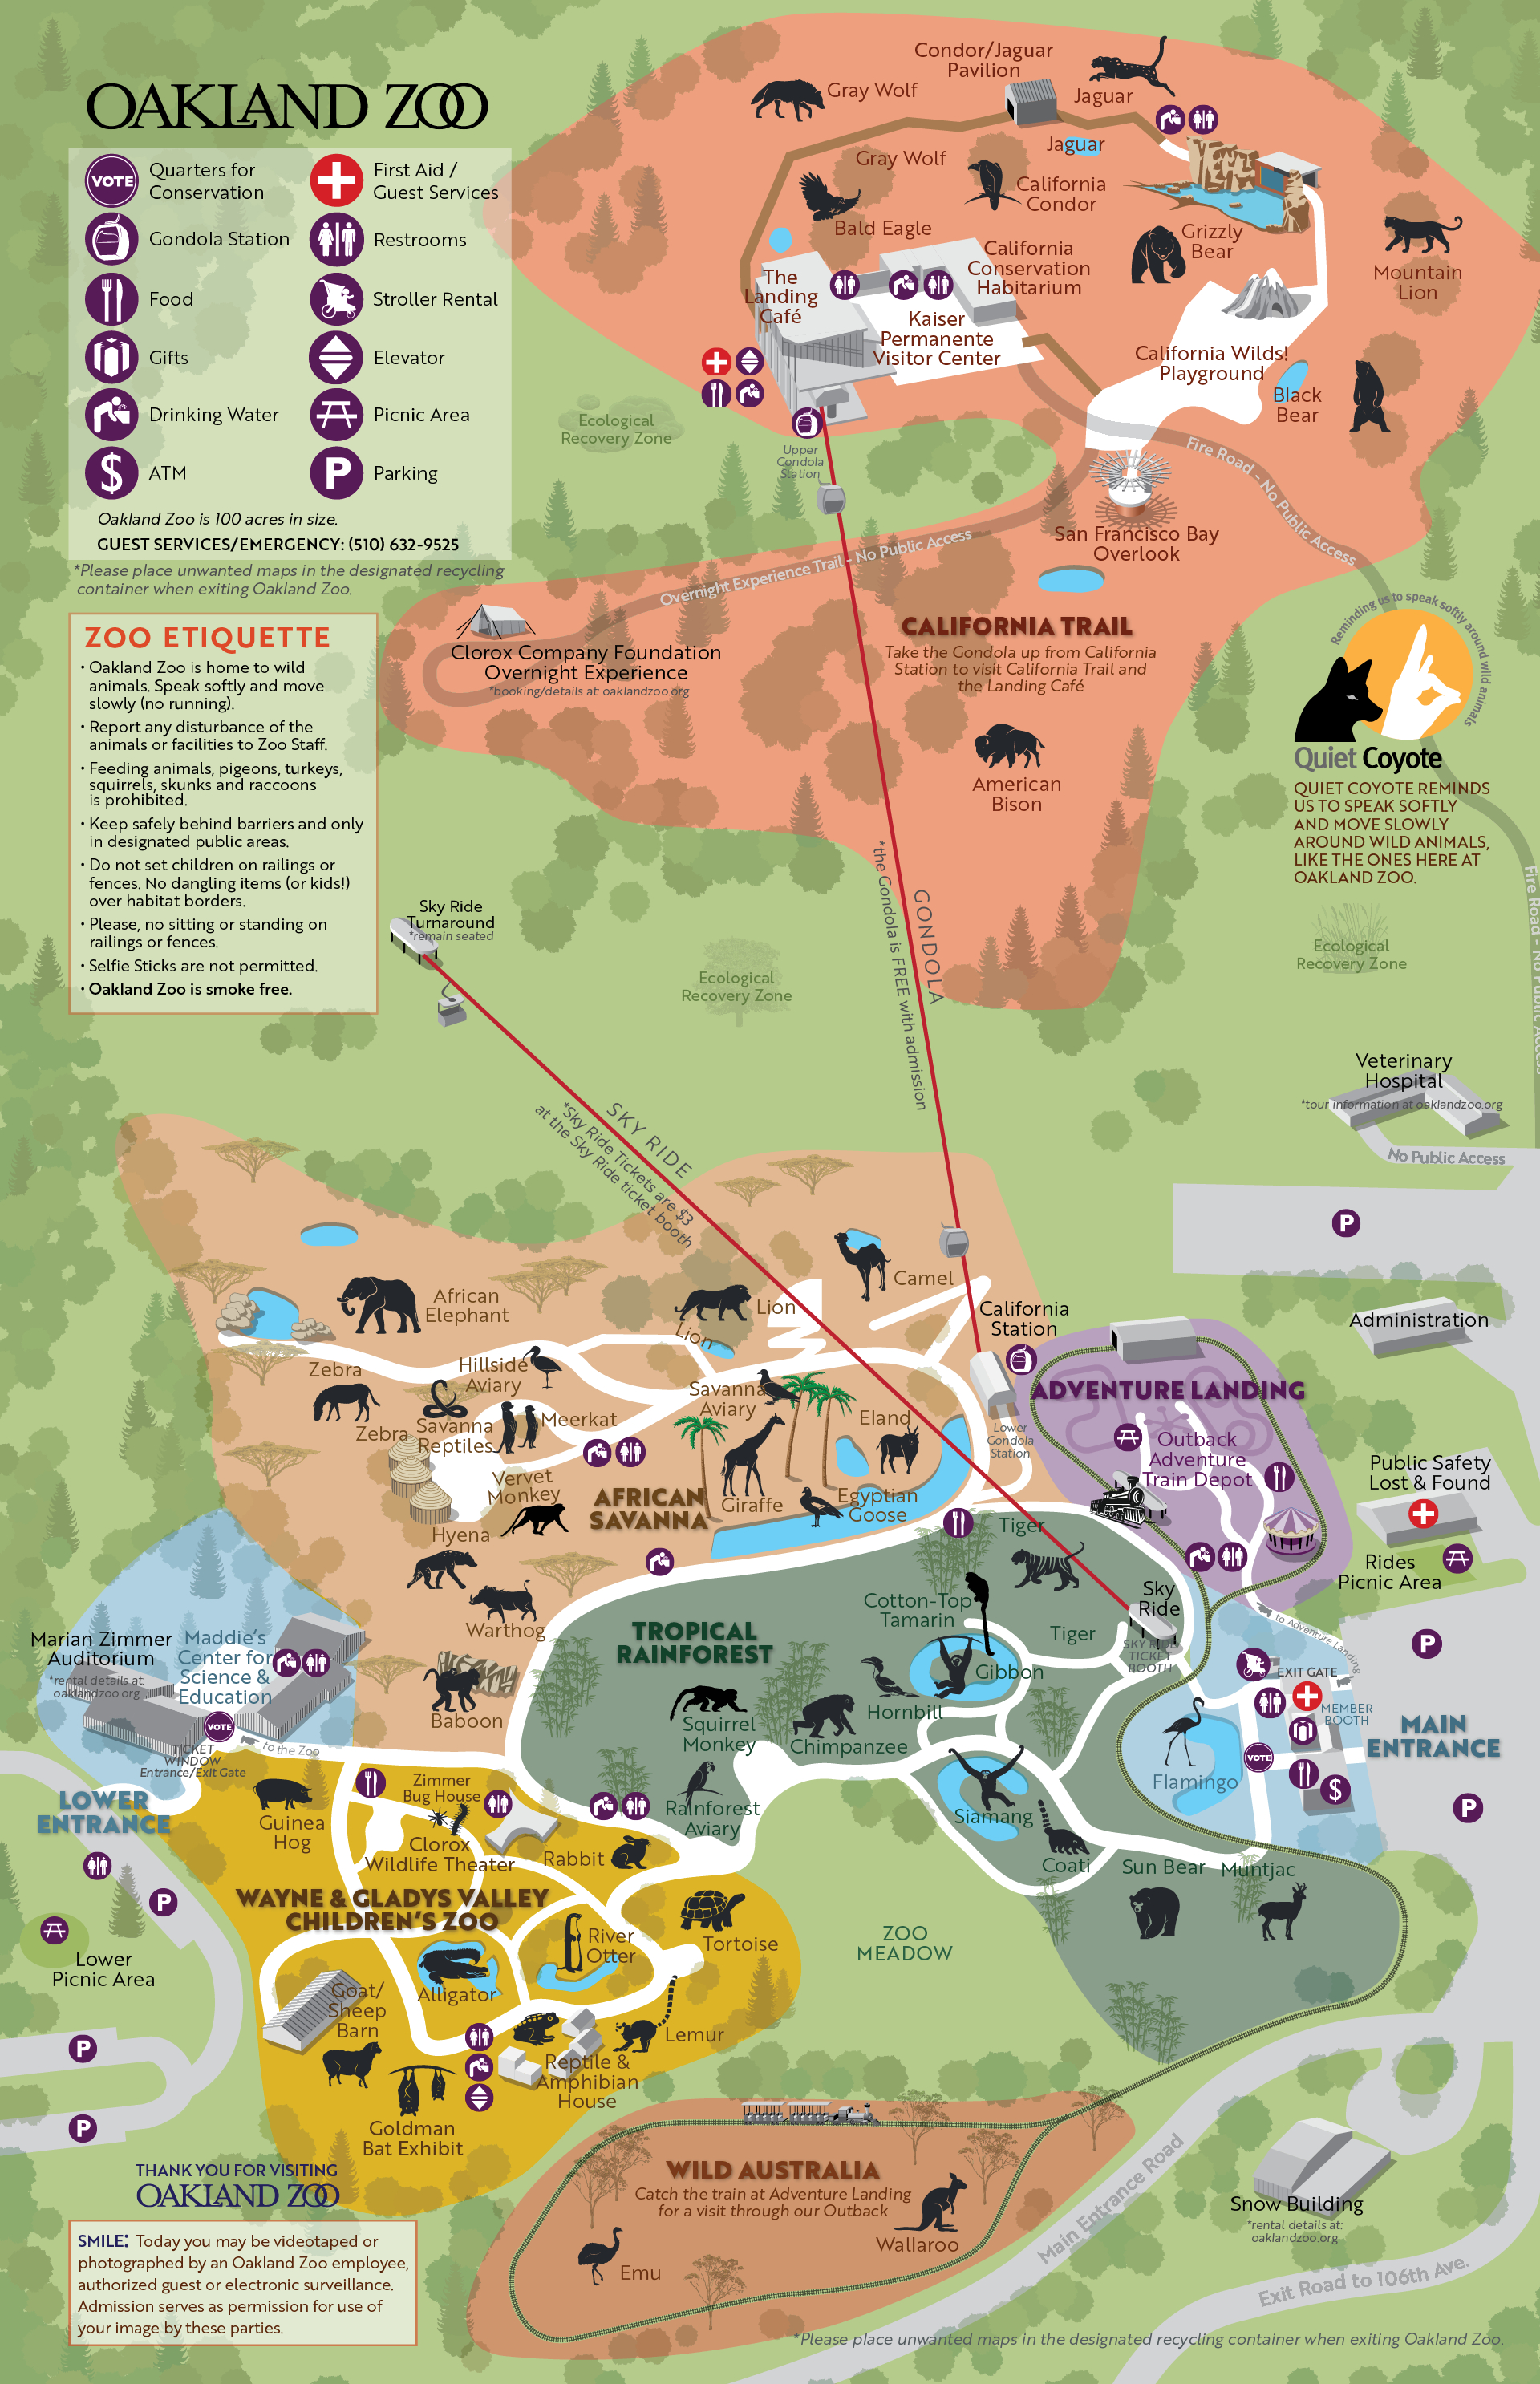 California Trail Oakland Zoo | Places | Oakland Zoo, Comic Books, Map - Oakland Zoo California Trail Map